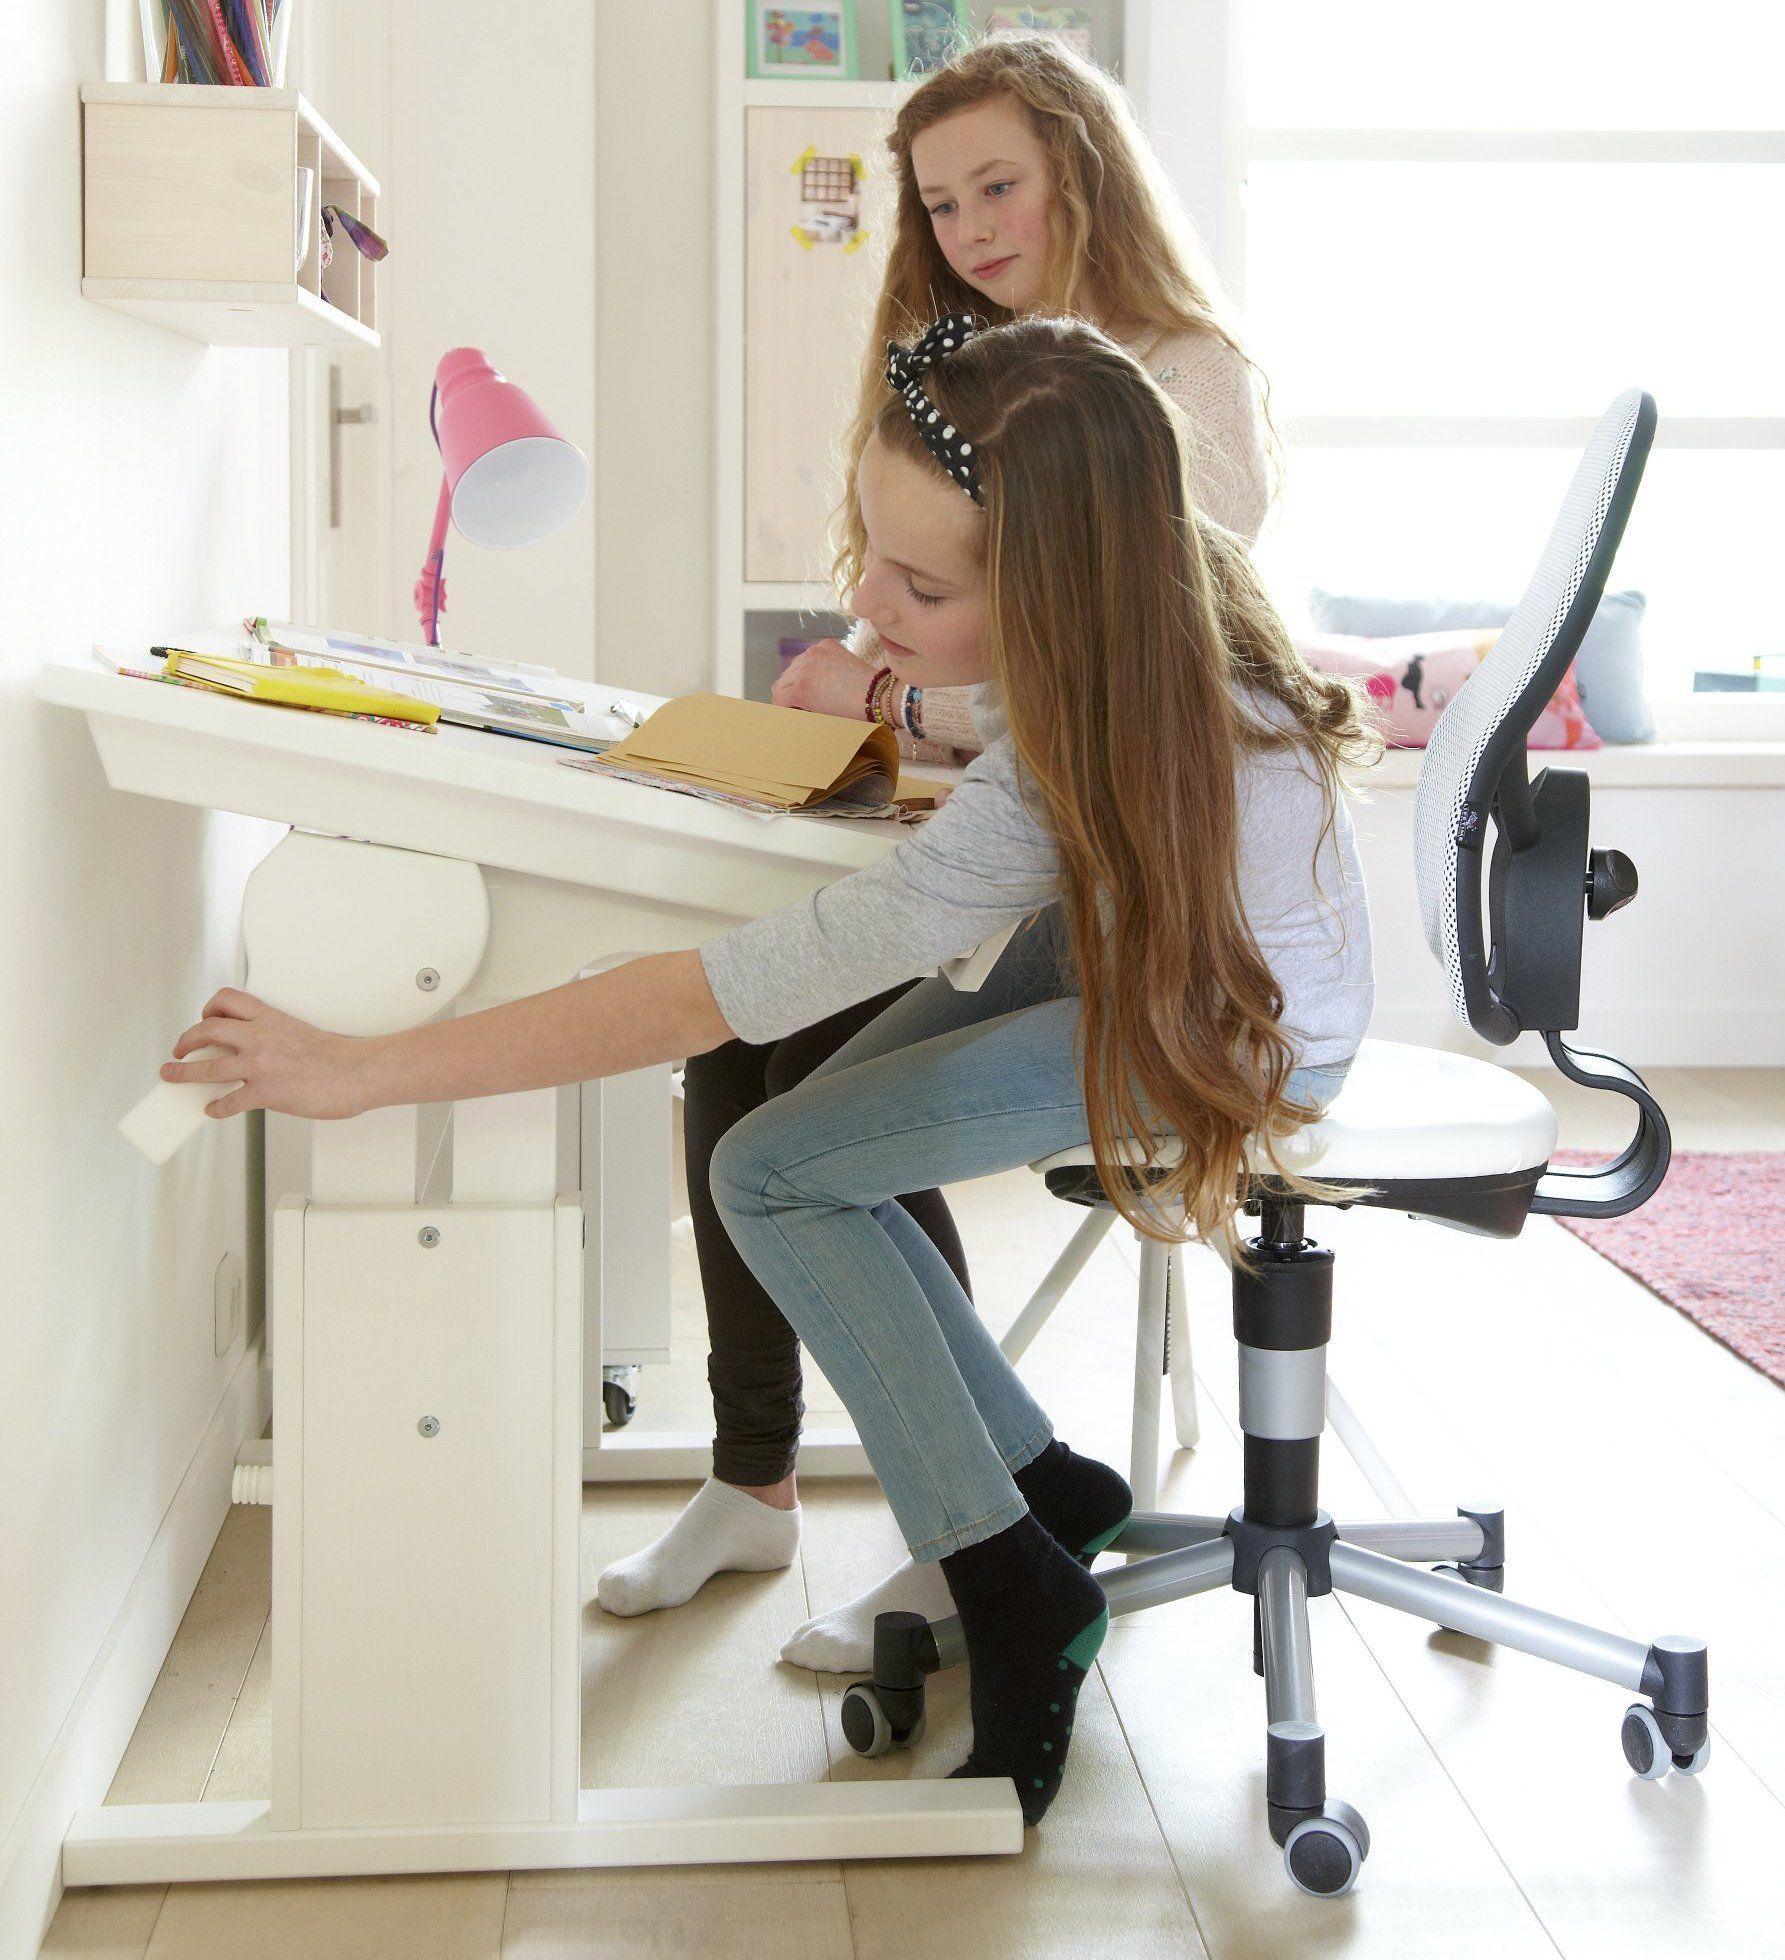 Small Desk Height Slant Adjustable By Lifetime Kidsrooms Adjustable Desk Adjustable Height Desk Childrens Desk